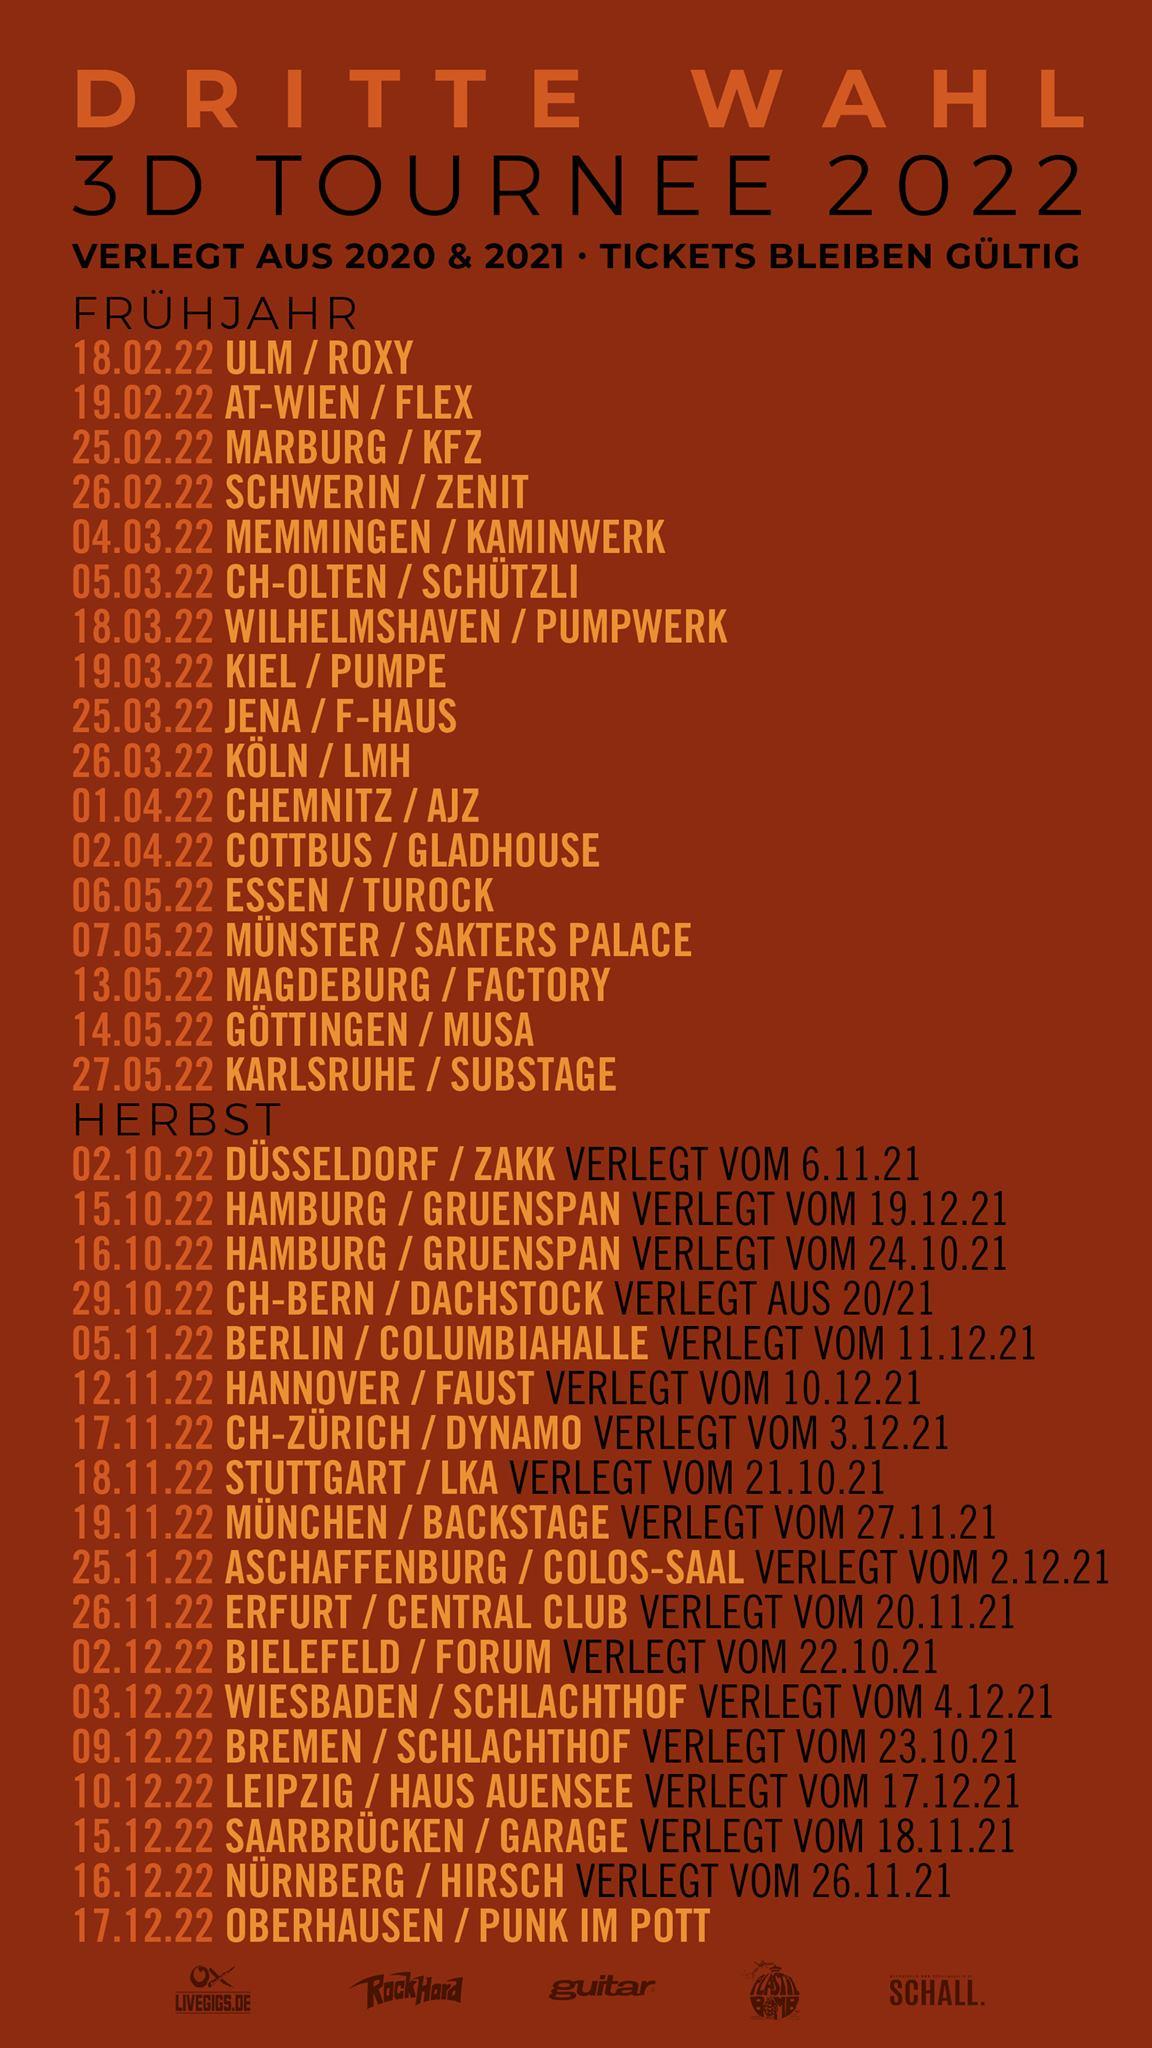 Dritte Wahl - 3D-Tournee 2022